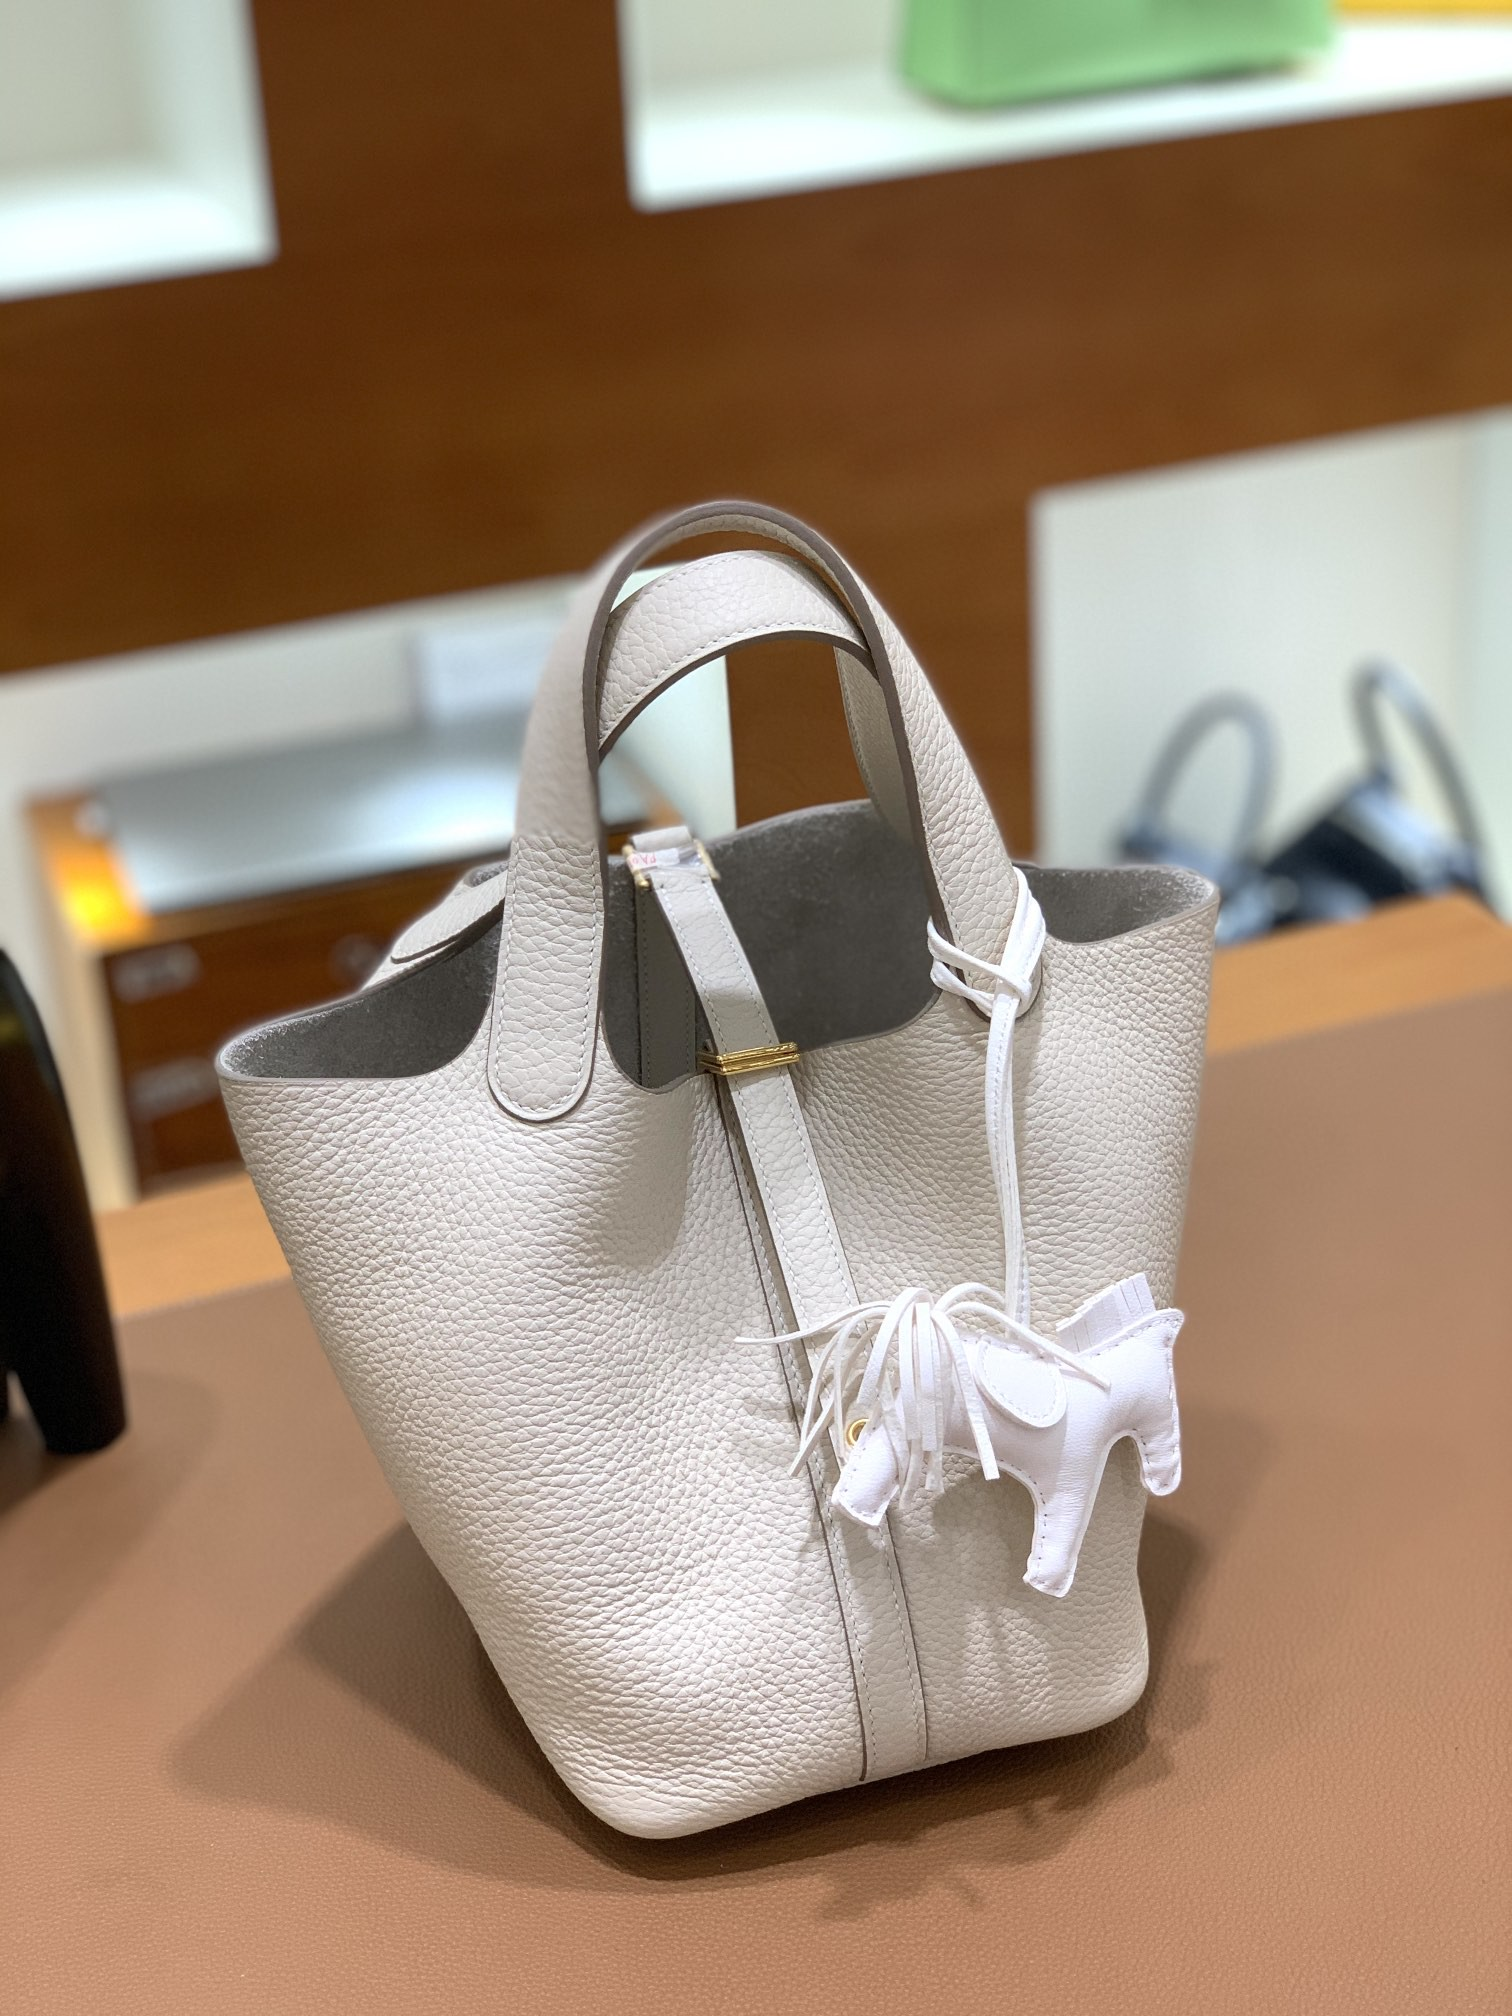 Hermès(爱马仕)Picotin 菜篮子 TC 奶昔白 金扣 18cm